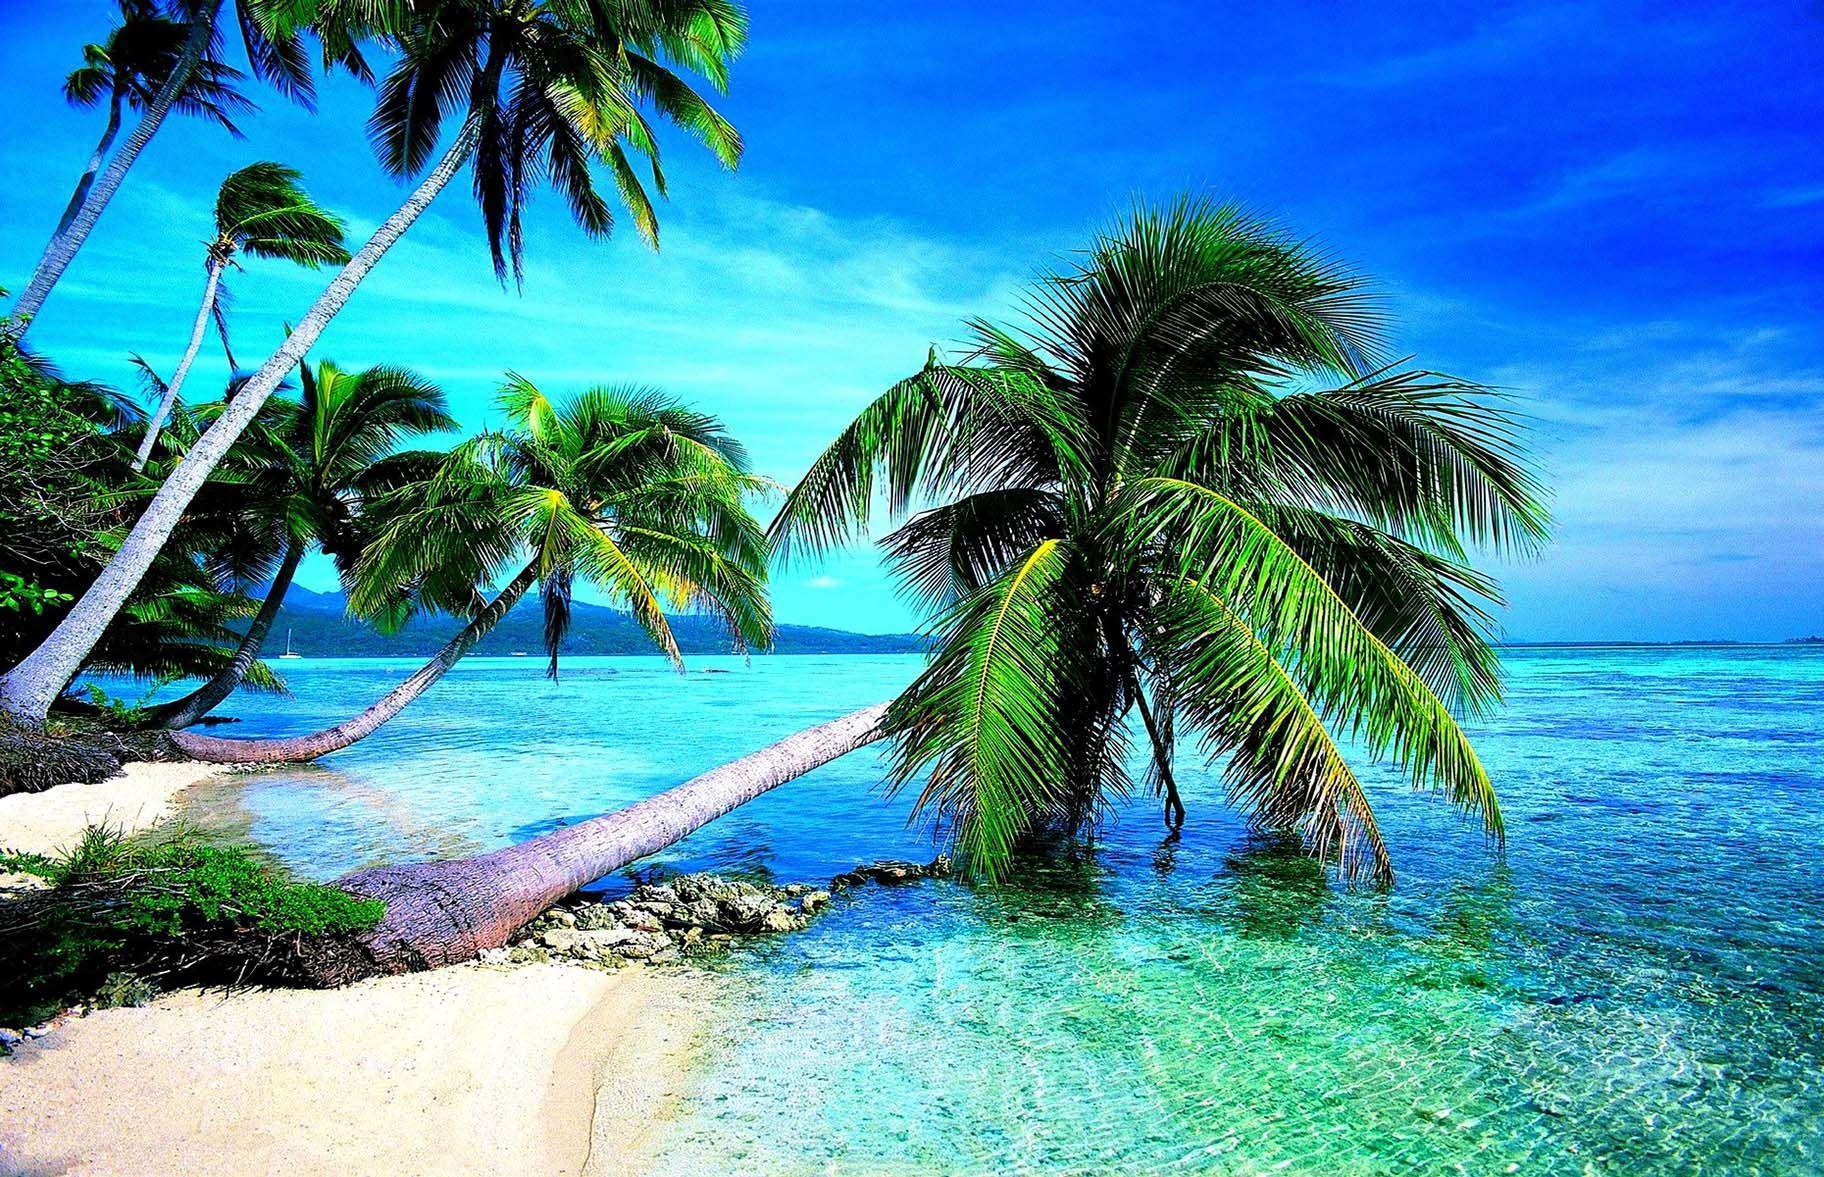 Trees On Beach Most Attractive Wallpapers Hd 4k Pemandangan Di Pantai Pantai